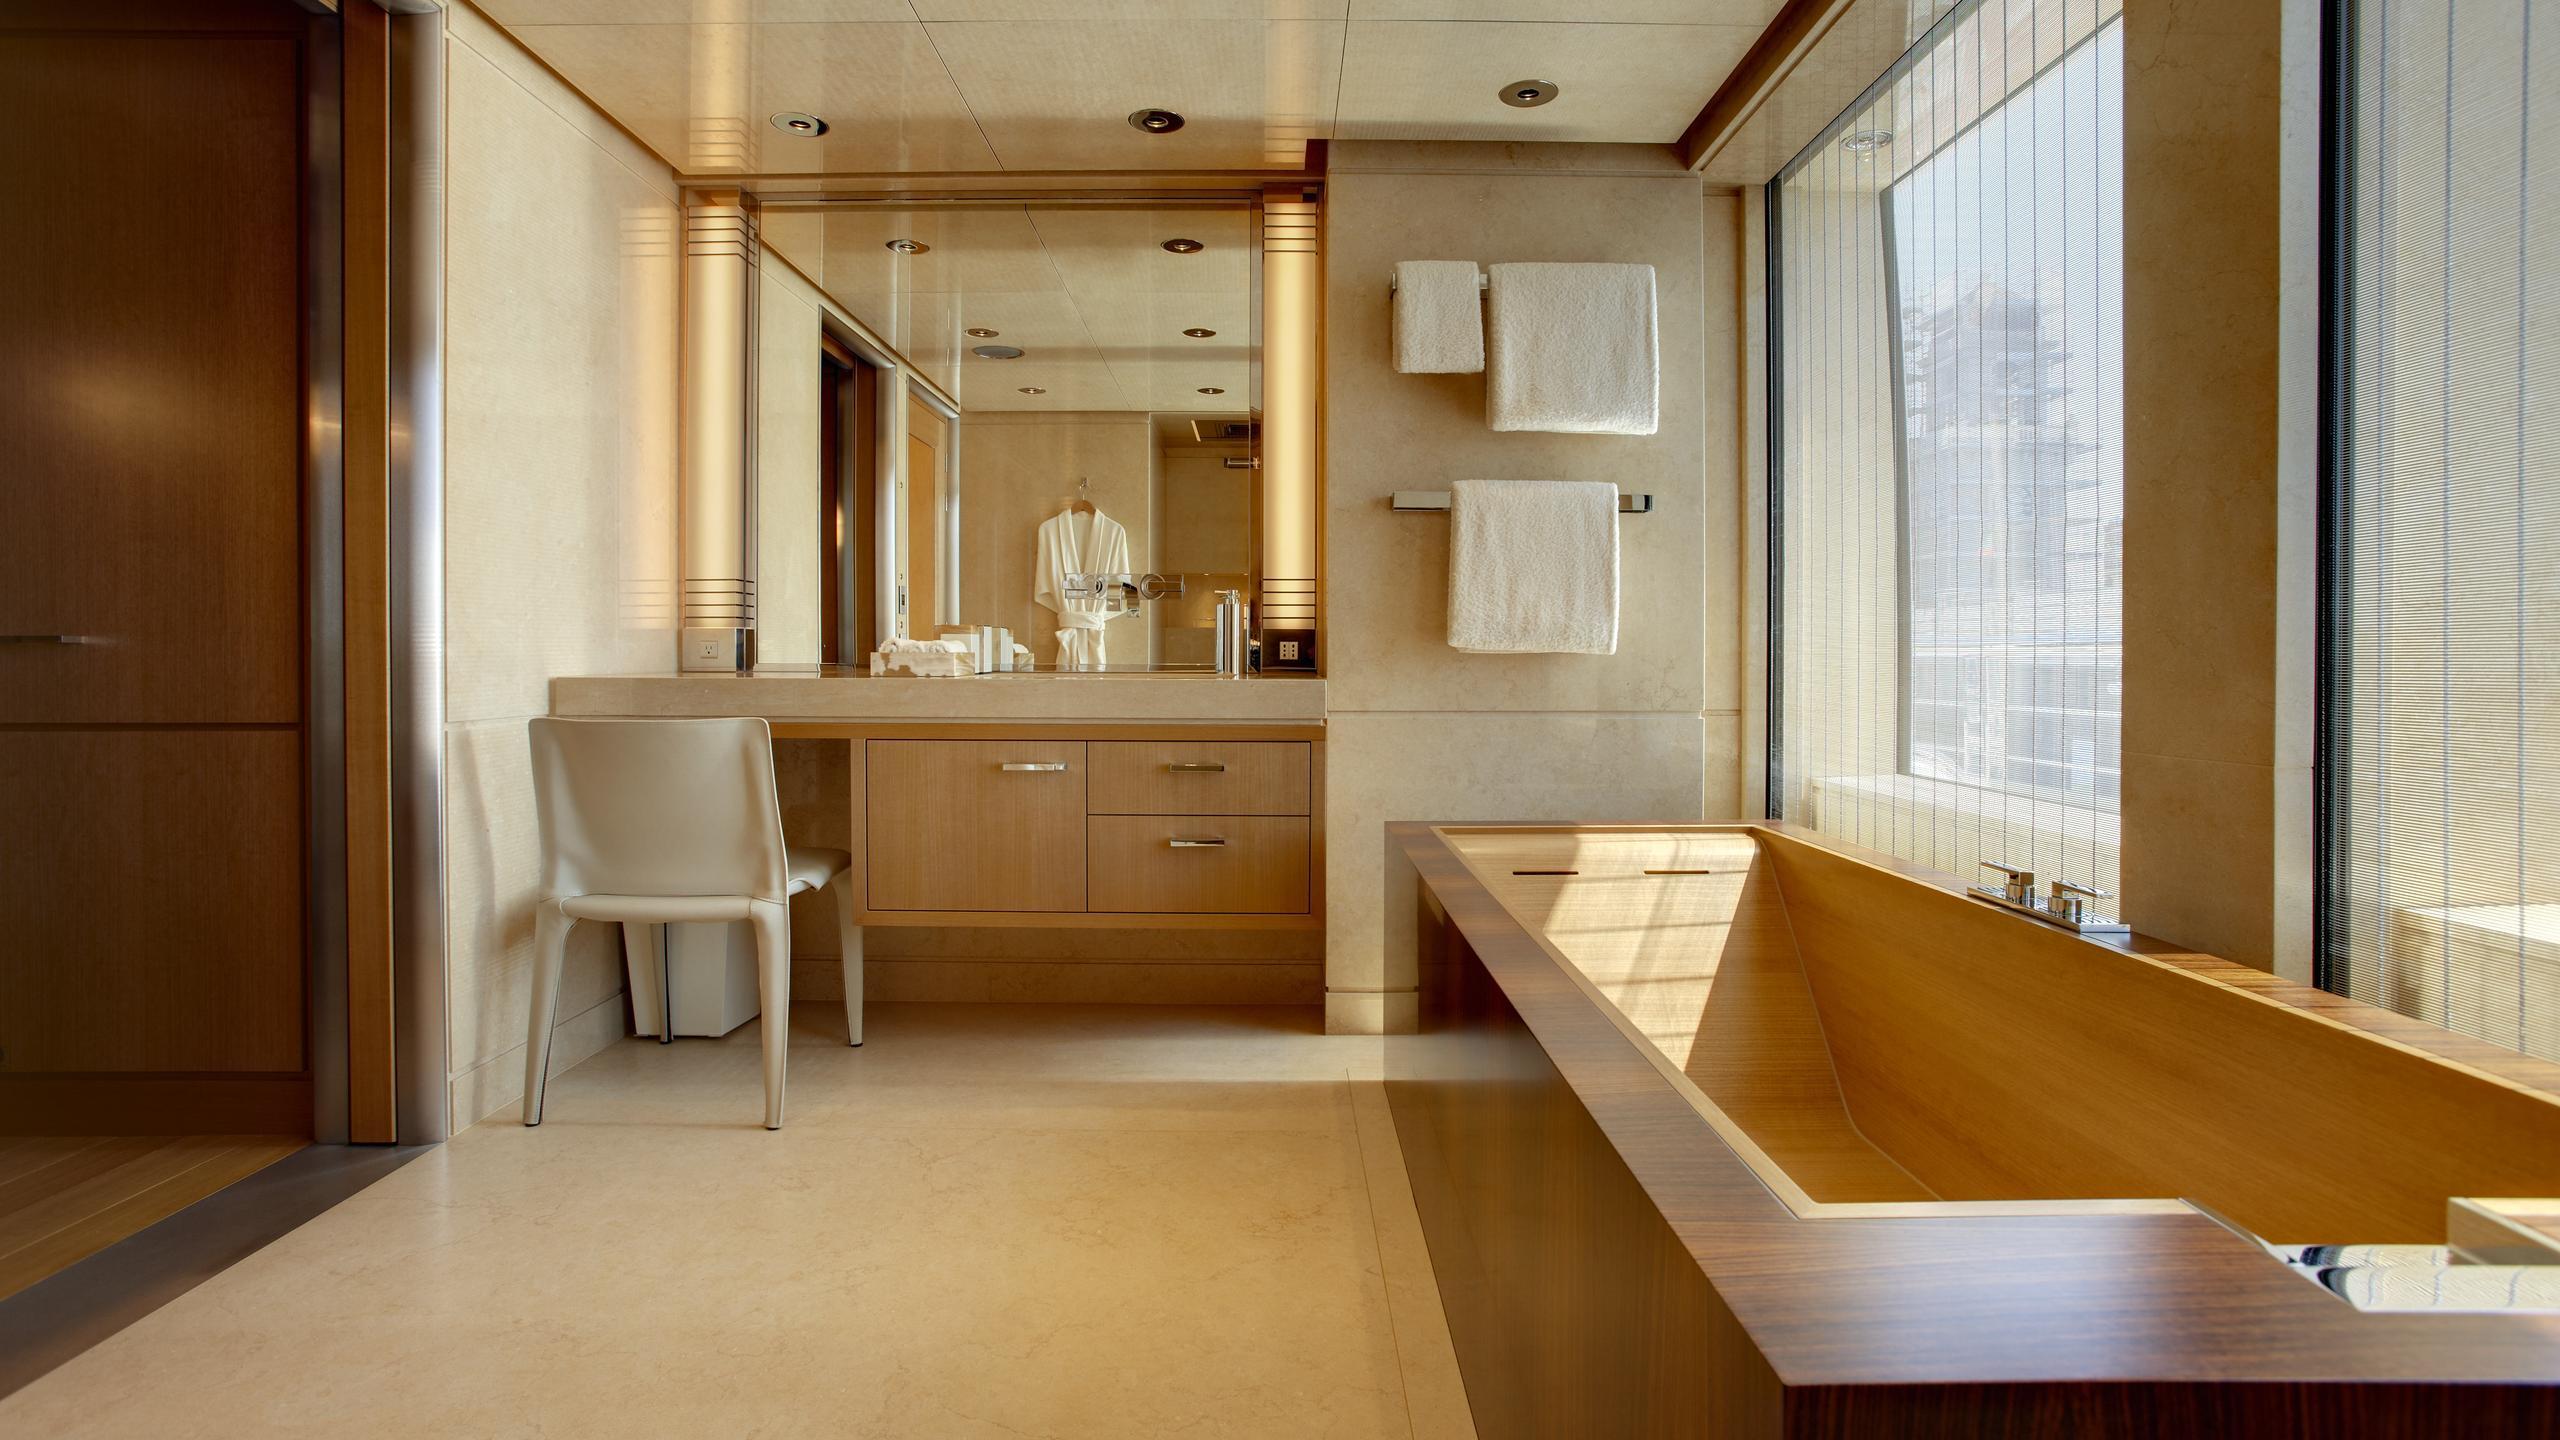 musashi-motor-yacht-feadhsip-2011-88m-bathroom